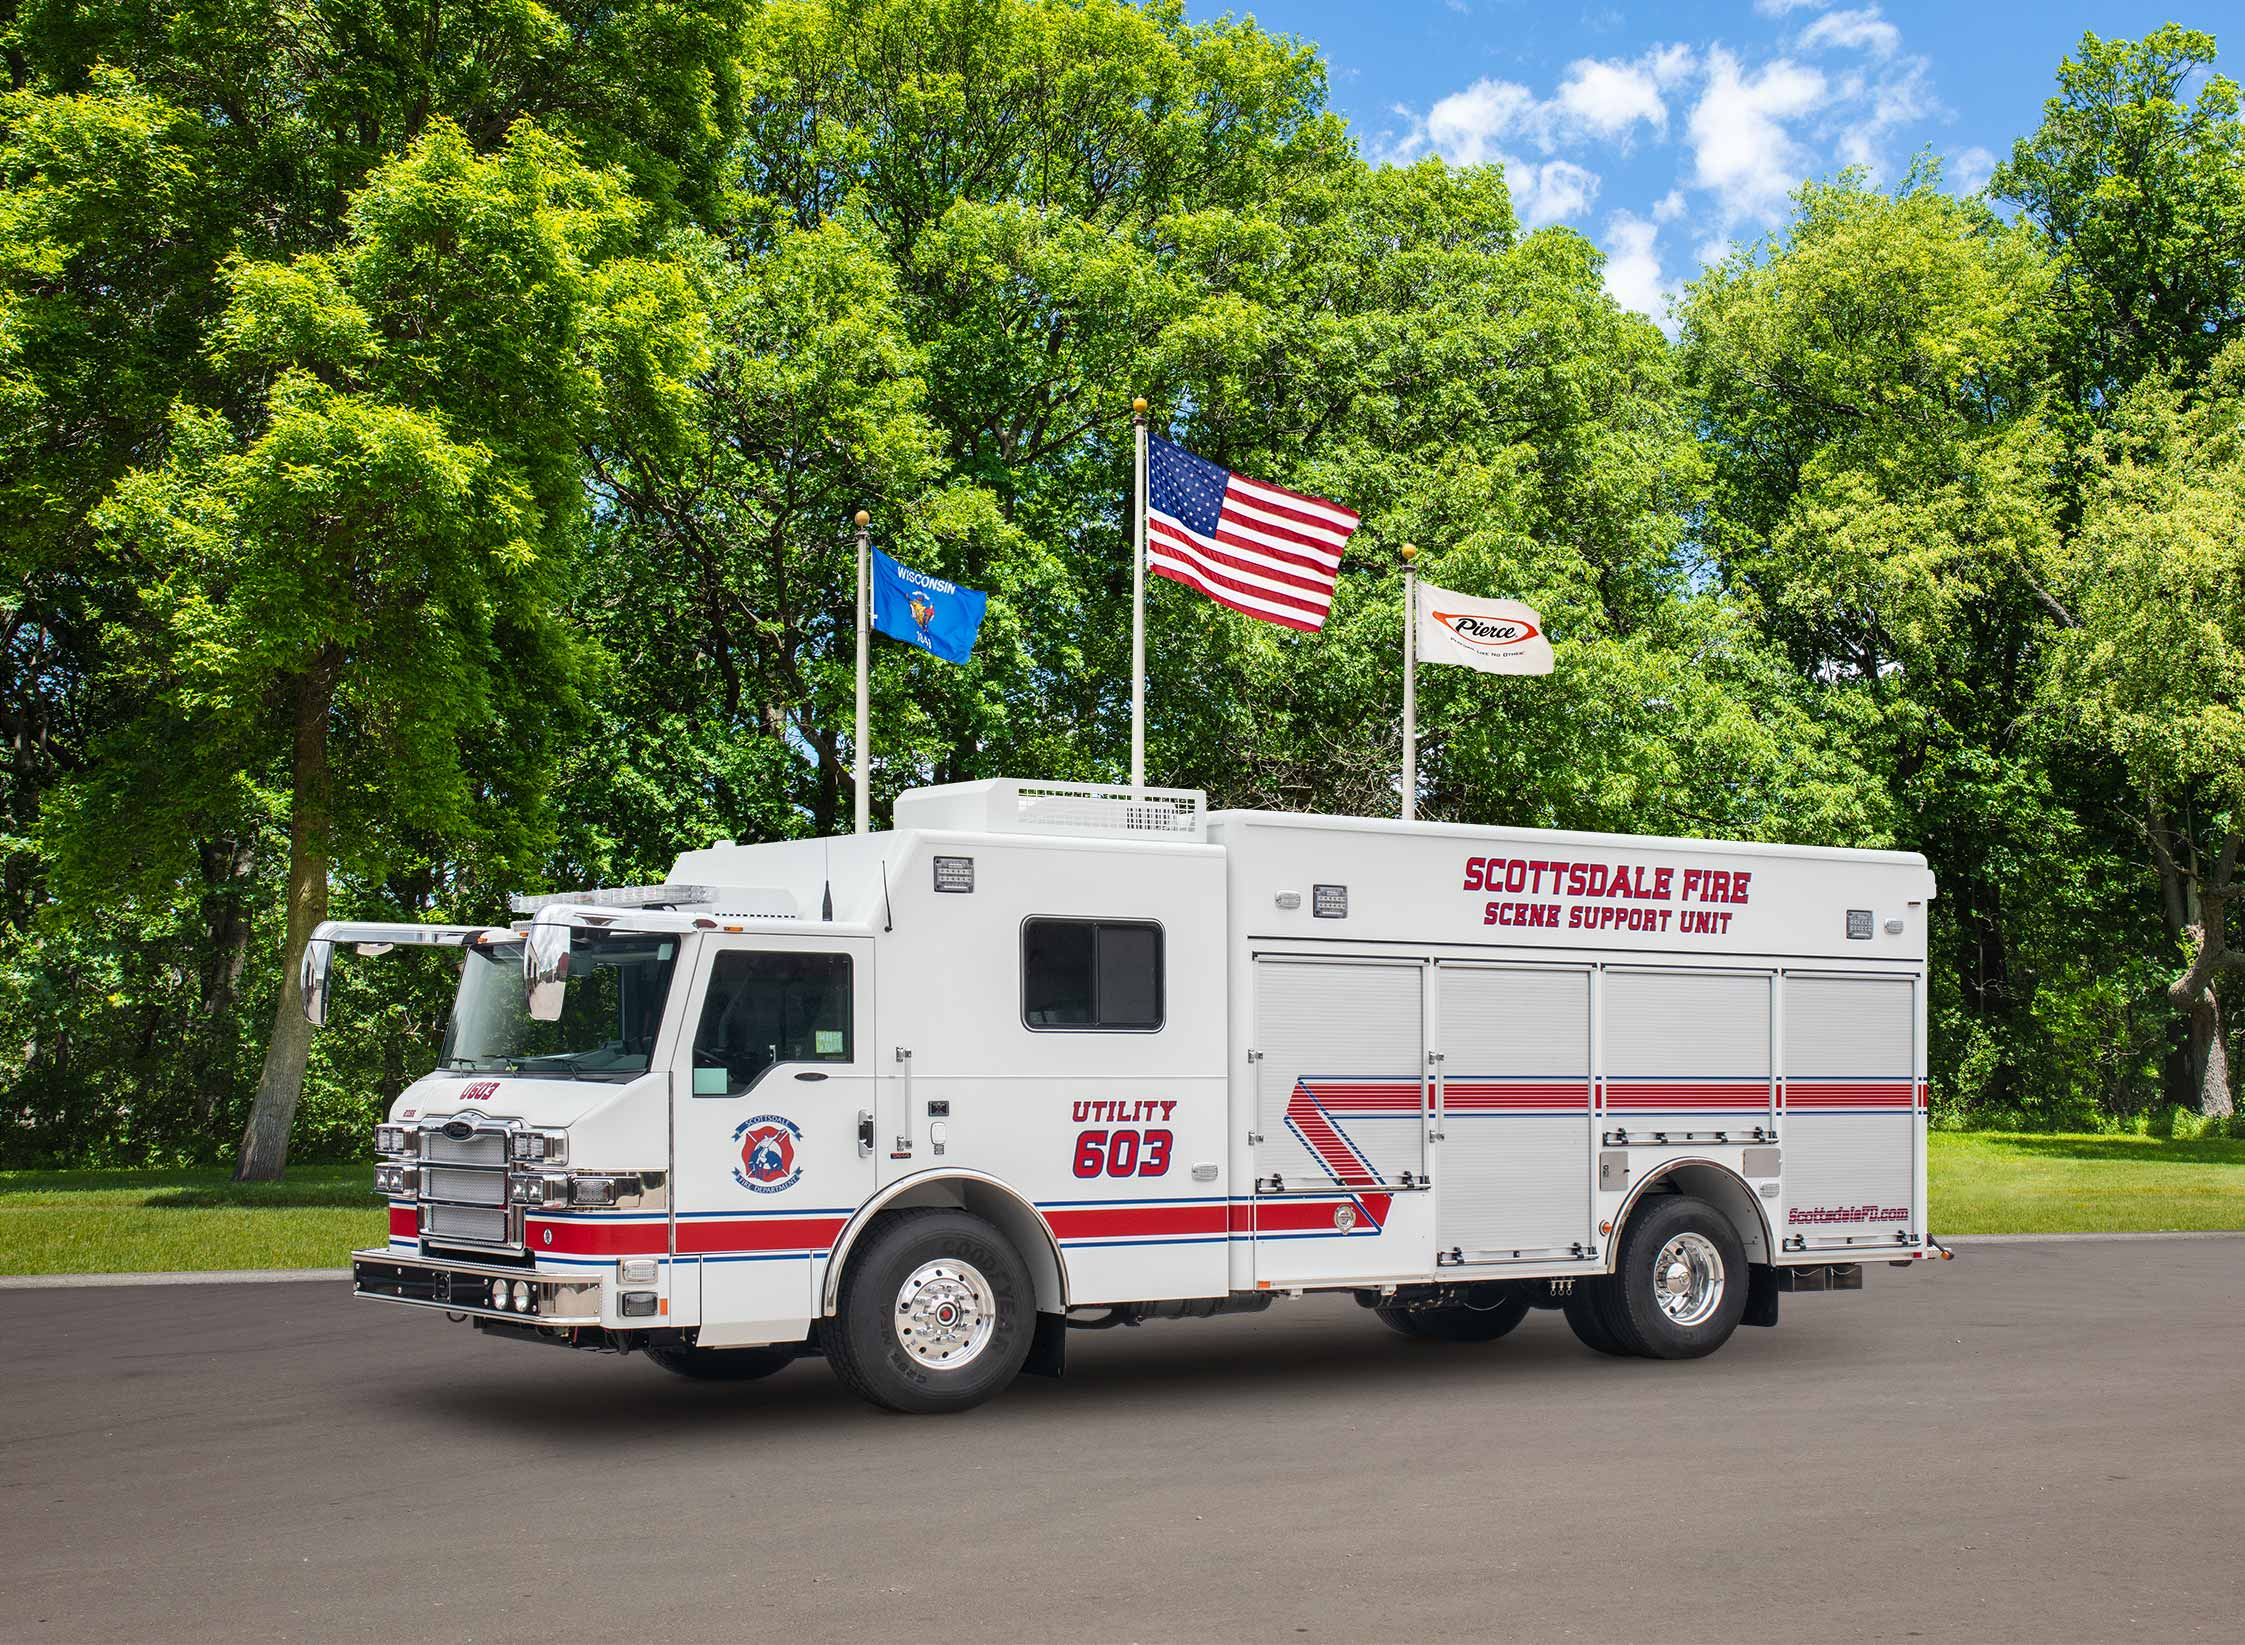 City of Scottsdale - Rescue